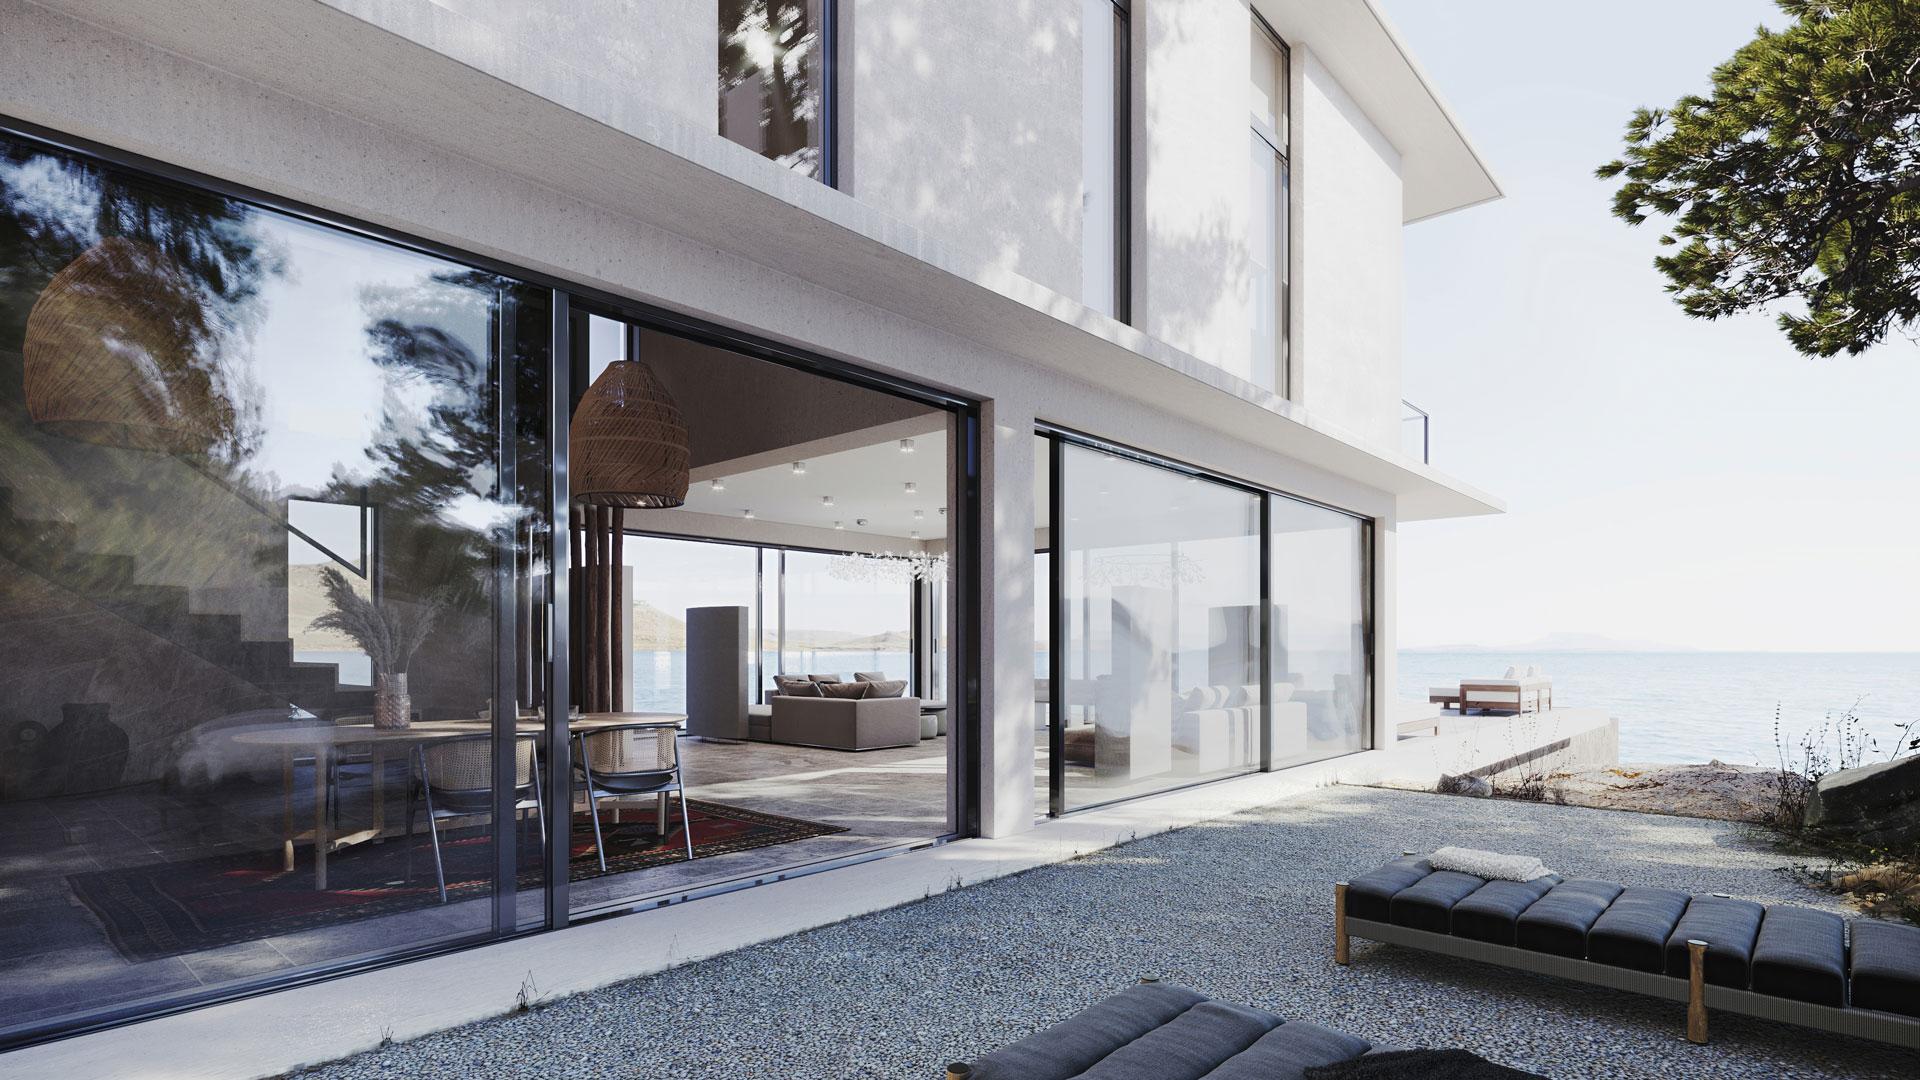 High-Quality 3D Render of a Contemporary Villa Exterior